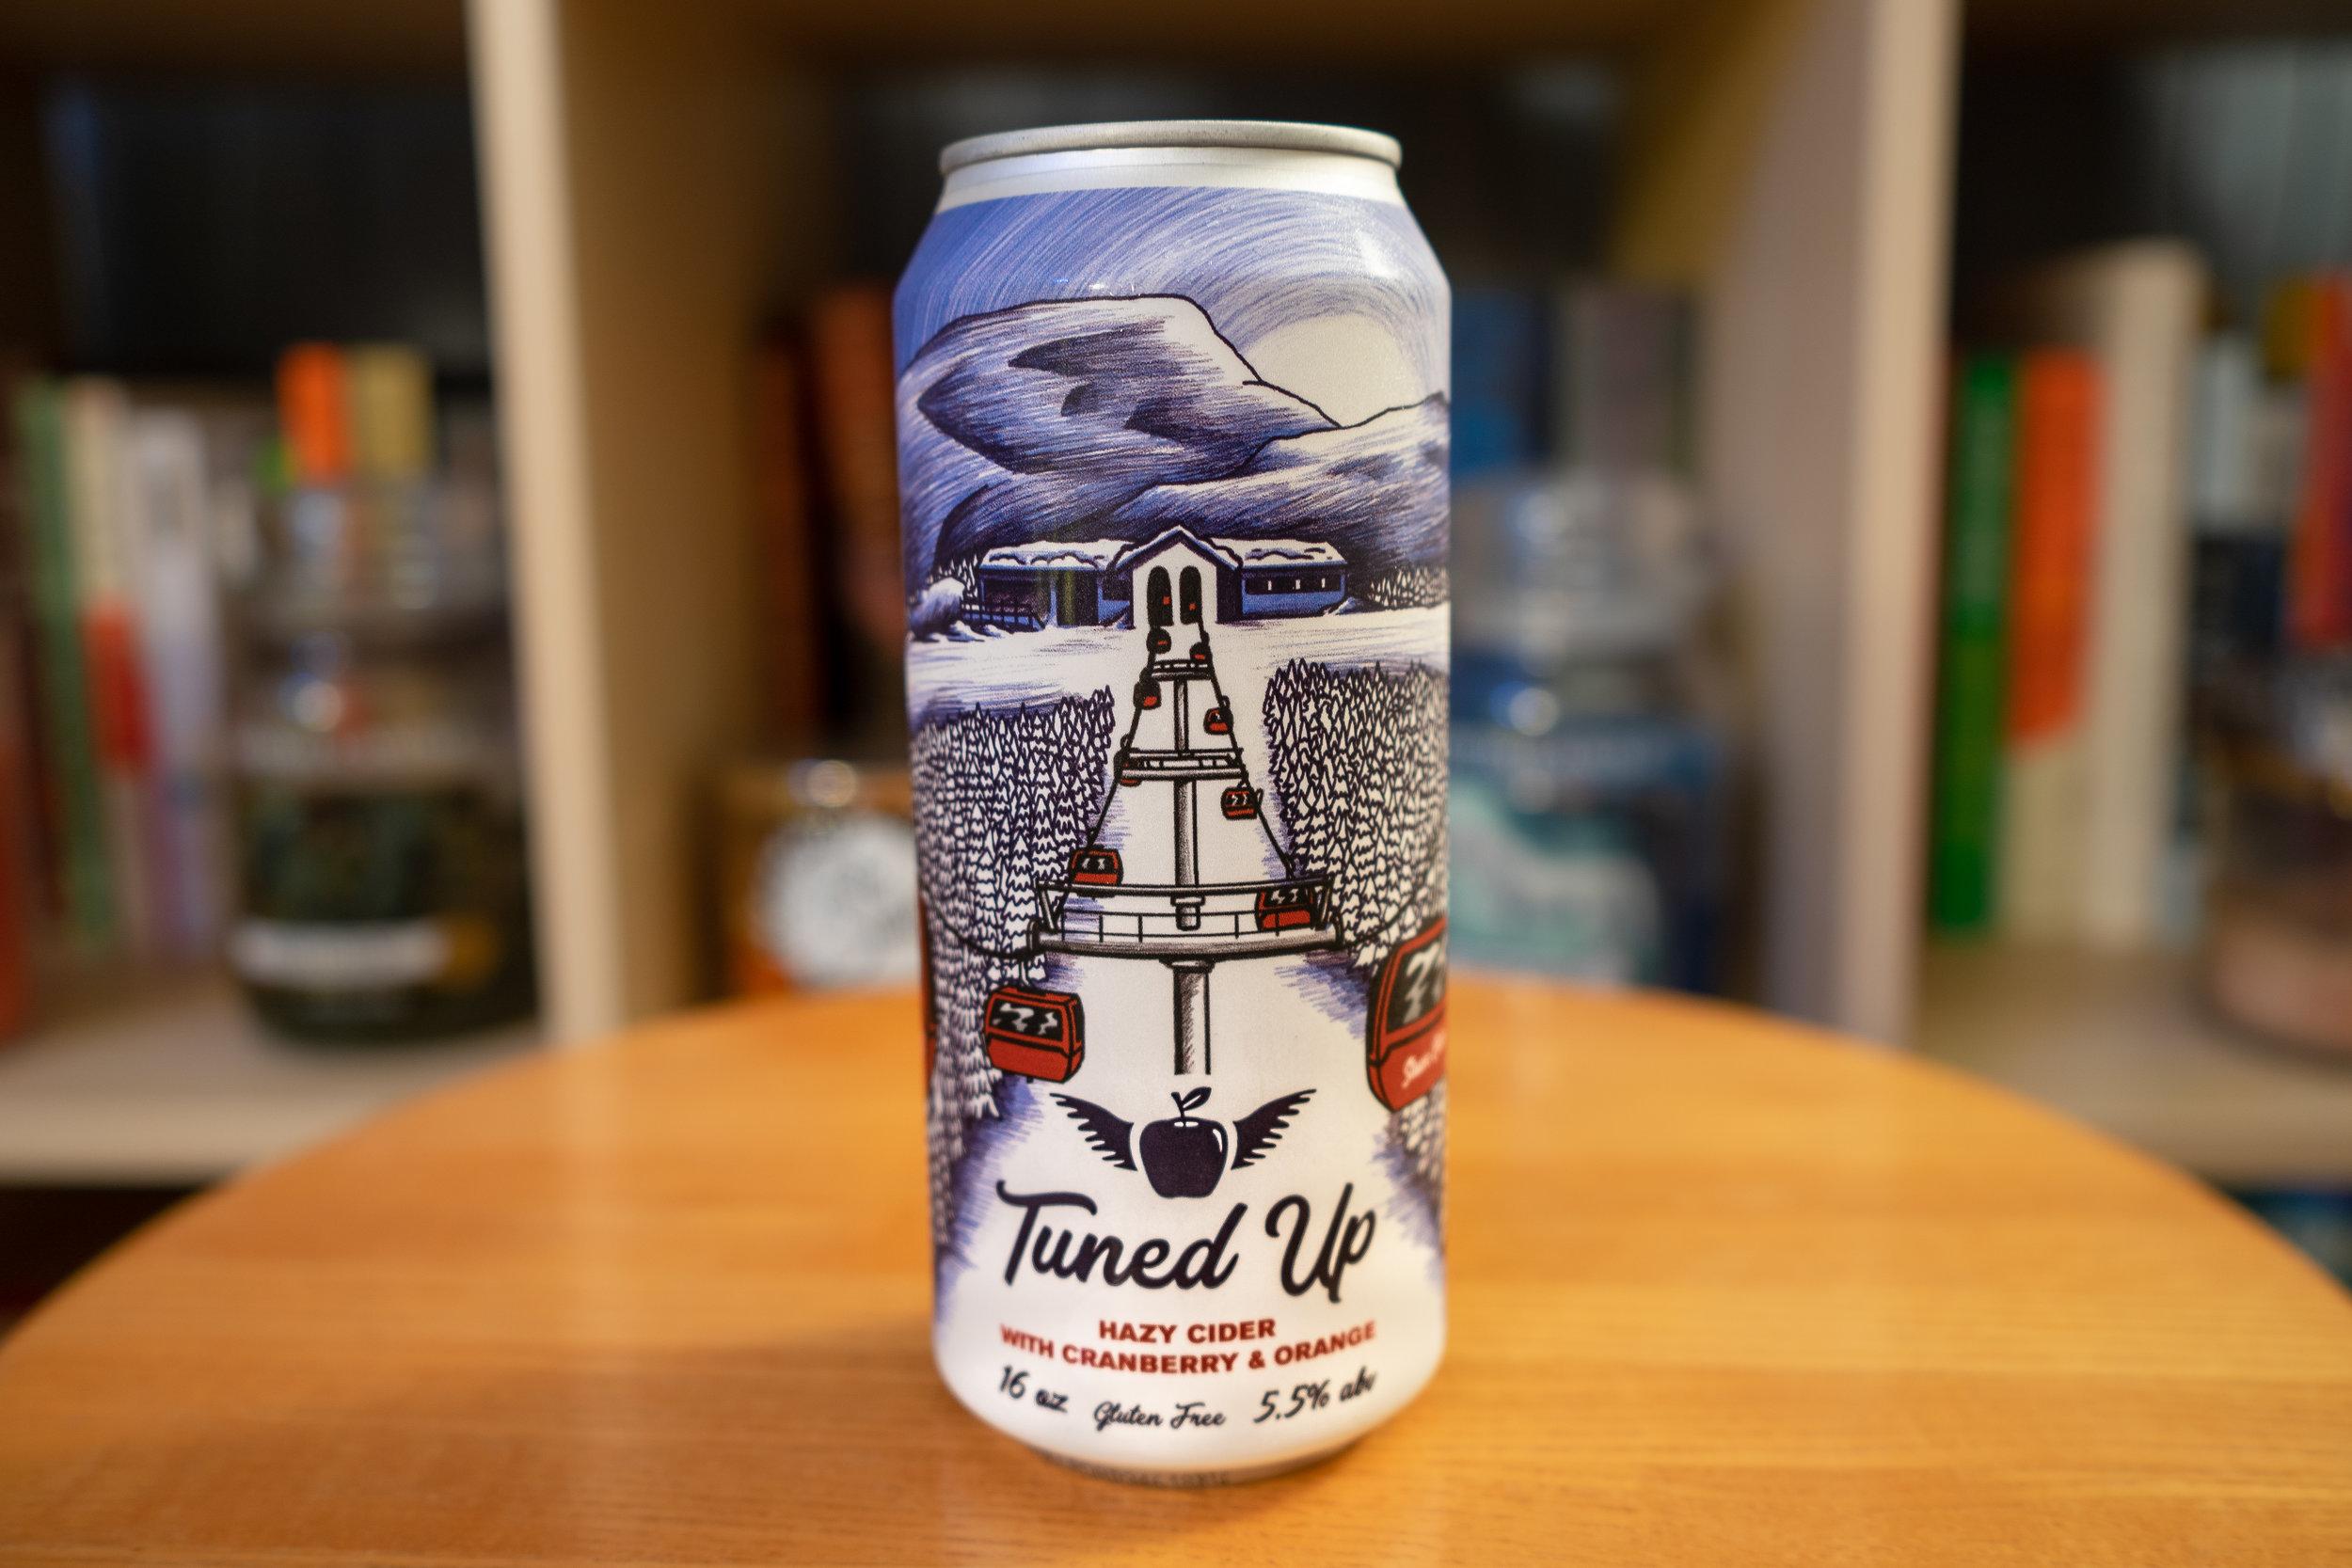 Stowe Cider Tuned Up